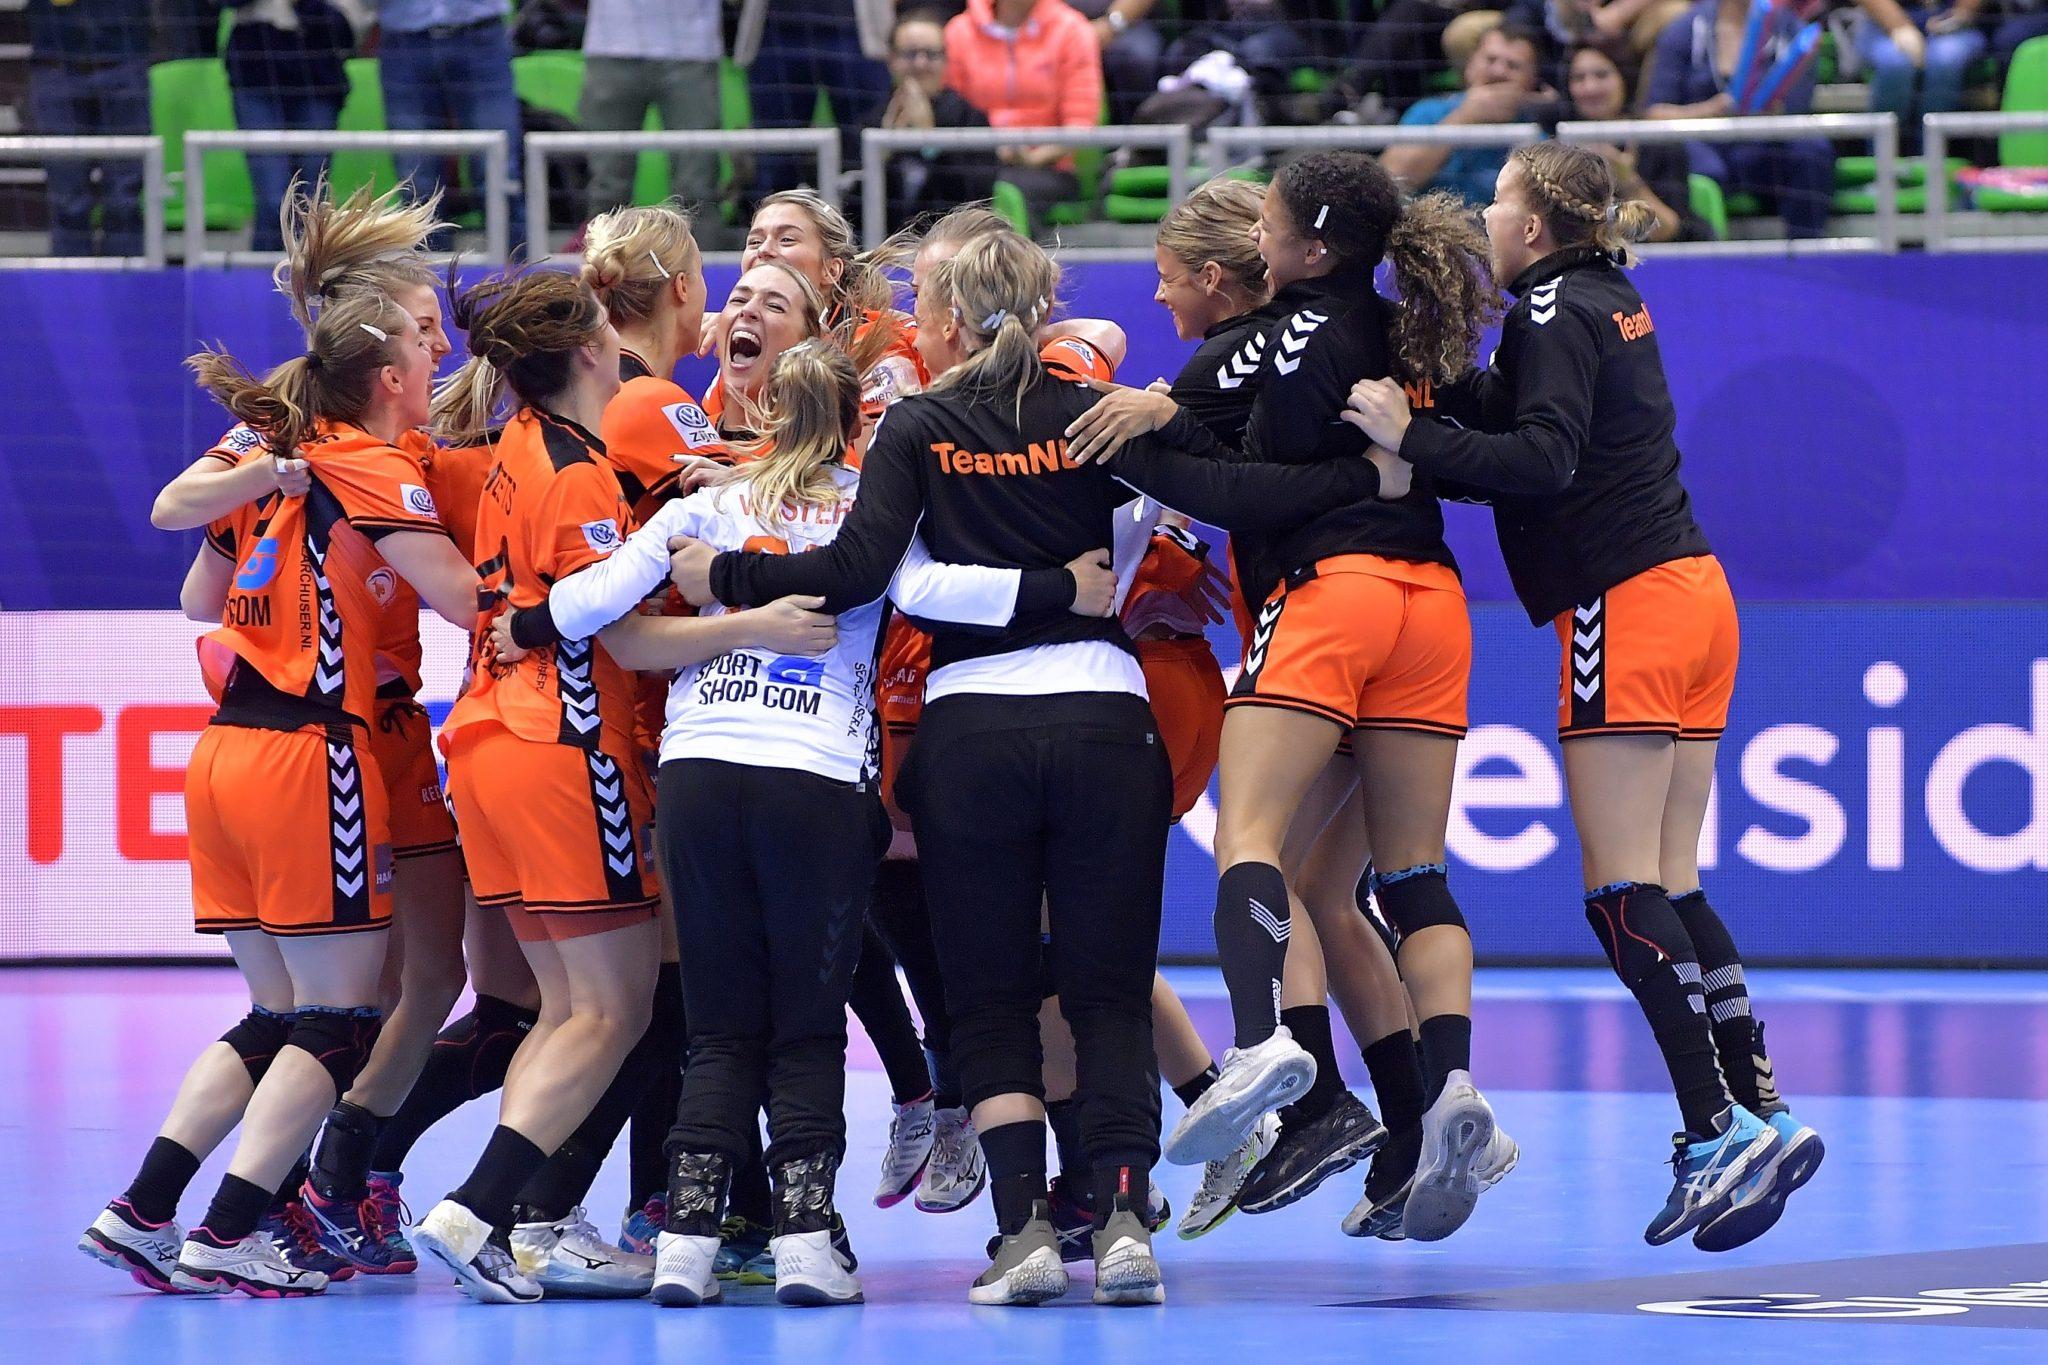 3-12-2018 HANDBAL:NEDERLAND-SPANJE:MONTBELIARD EK Handbal In Frankrijk, Voorronde Groep C Nederland - Spanje Nederland Viert De Overwinning